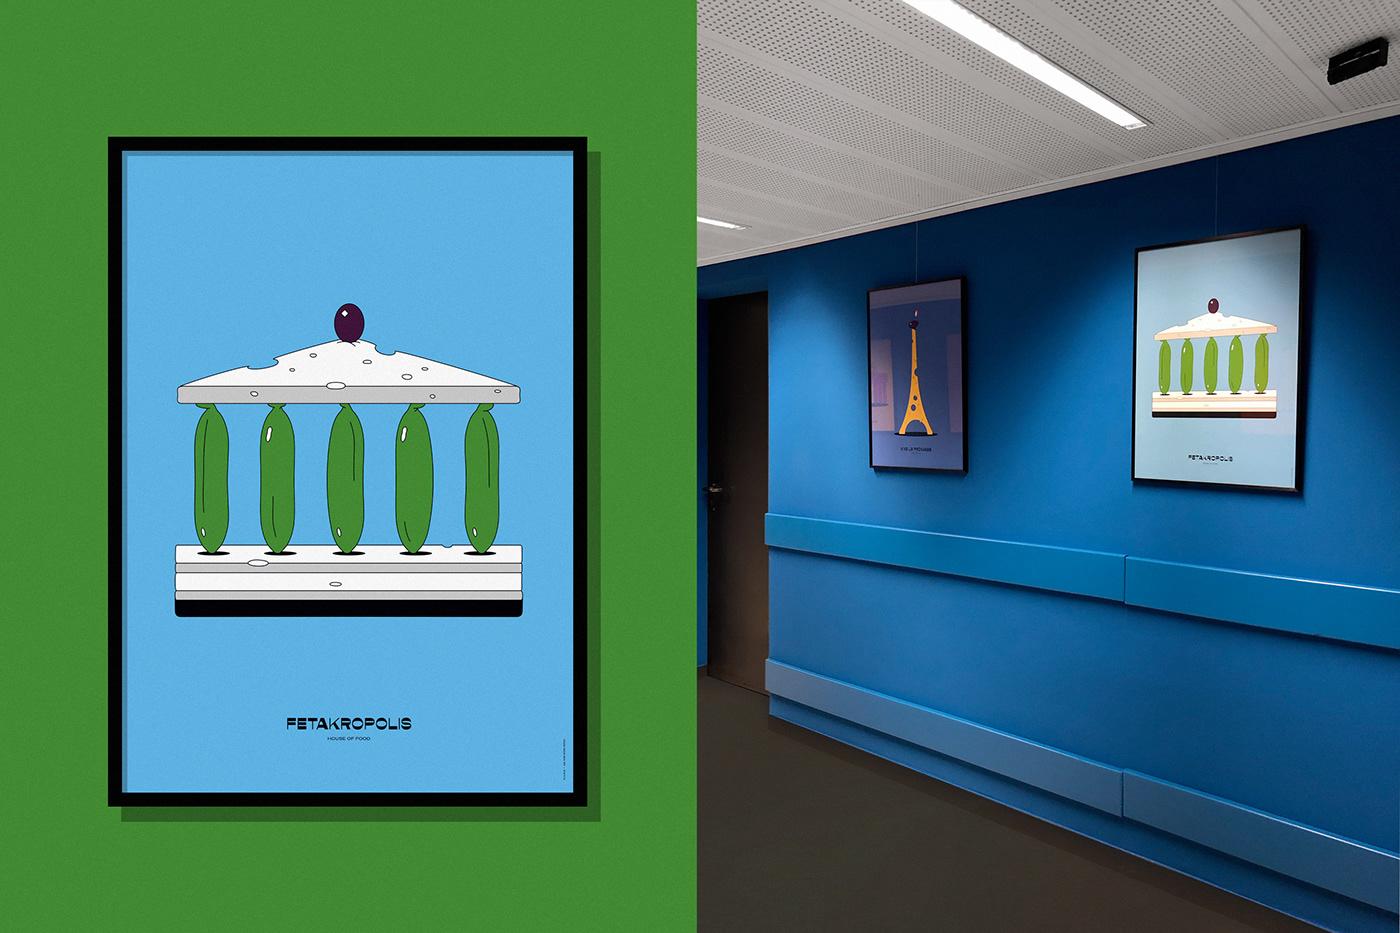 art contemporary design ILLUSTRATION  Interior JULIANFAUDT muralart stefanmückner WABB wearebürobüro